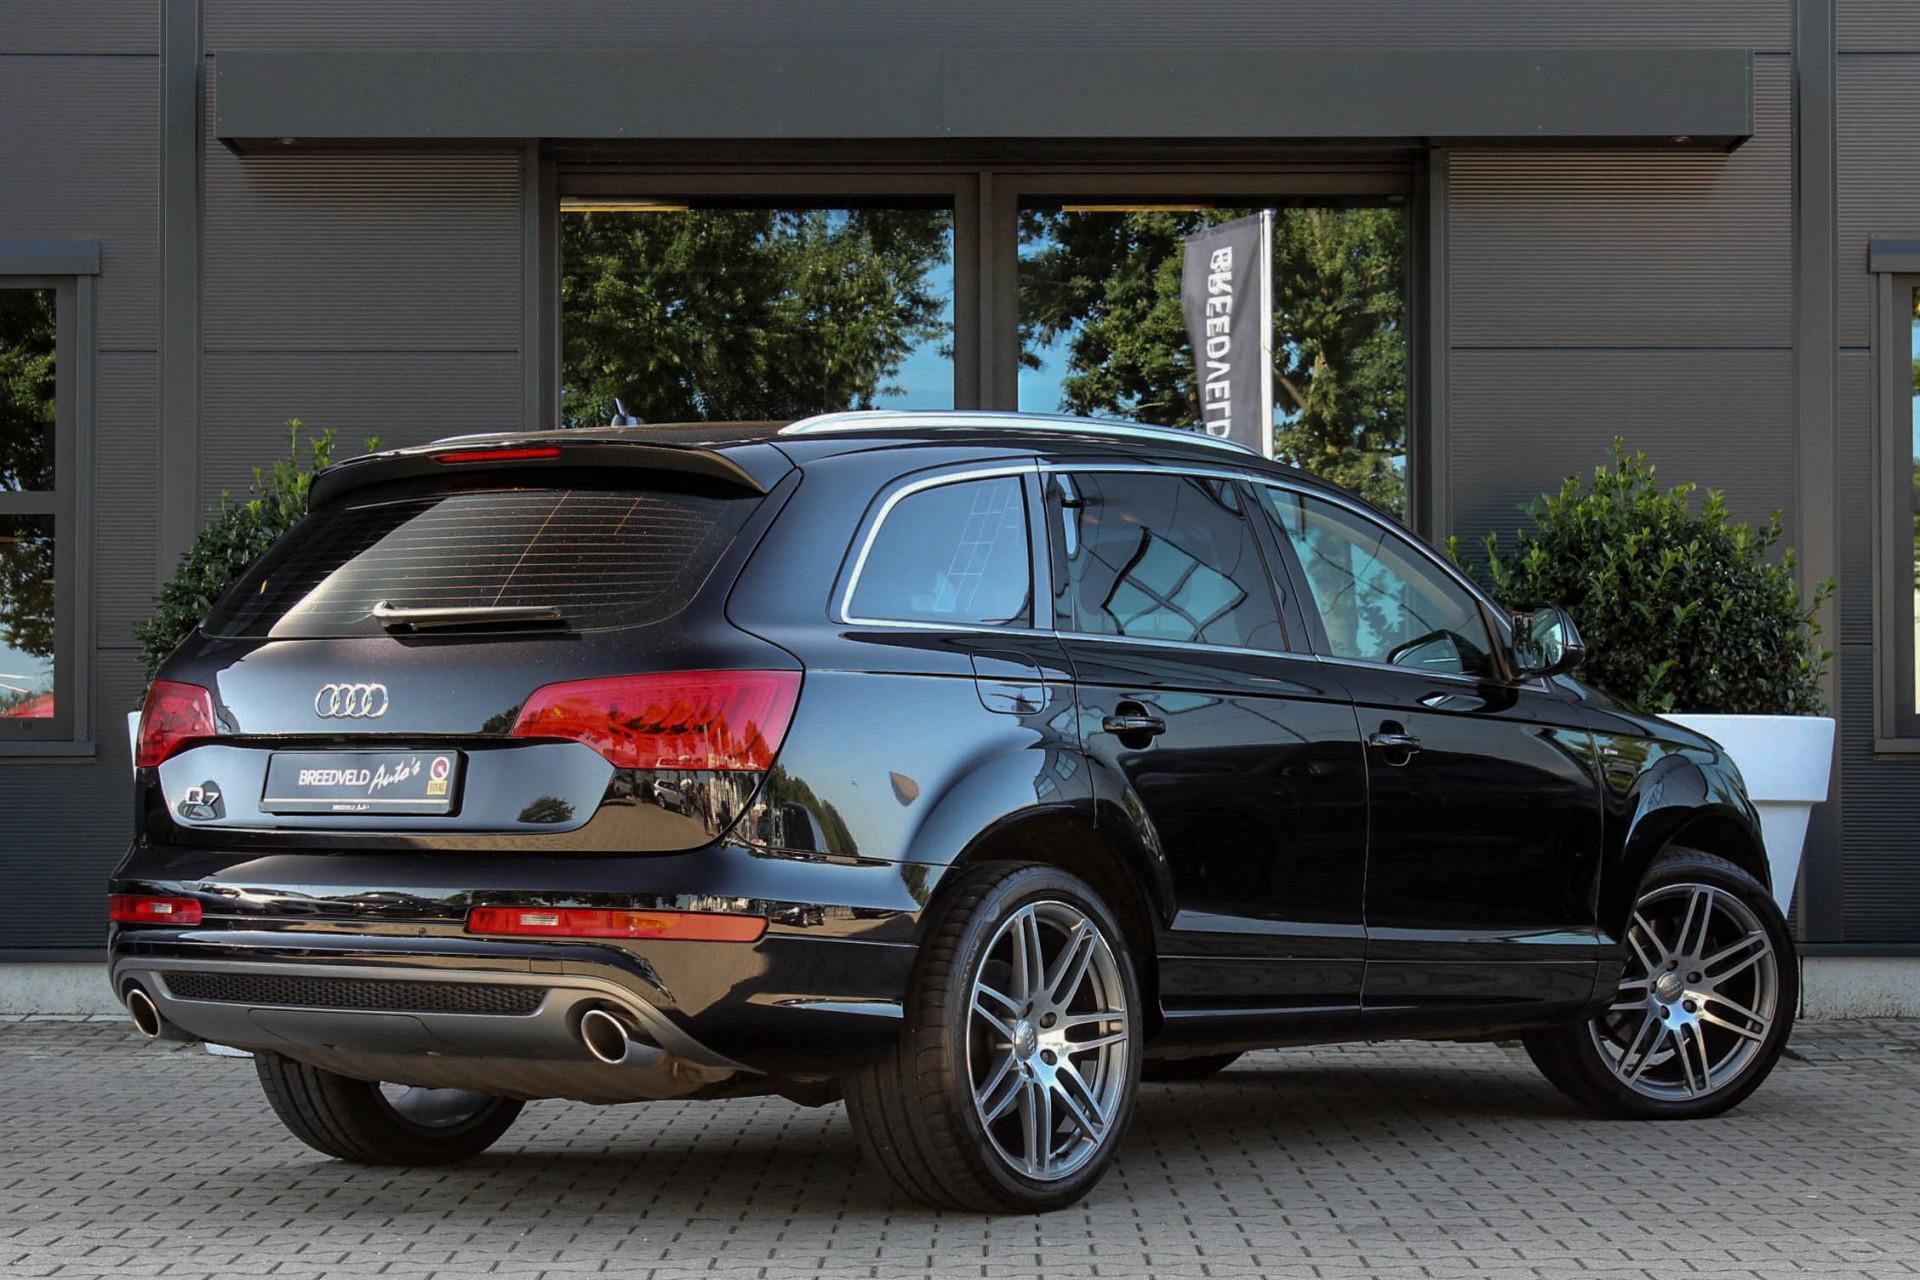 Tweedehands Audi Q7 2011 occasion